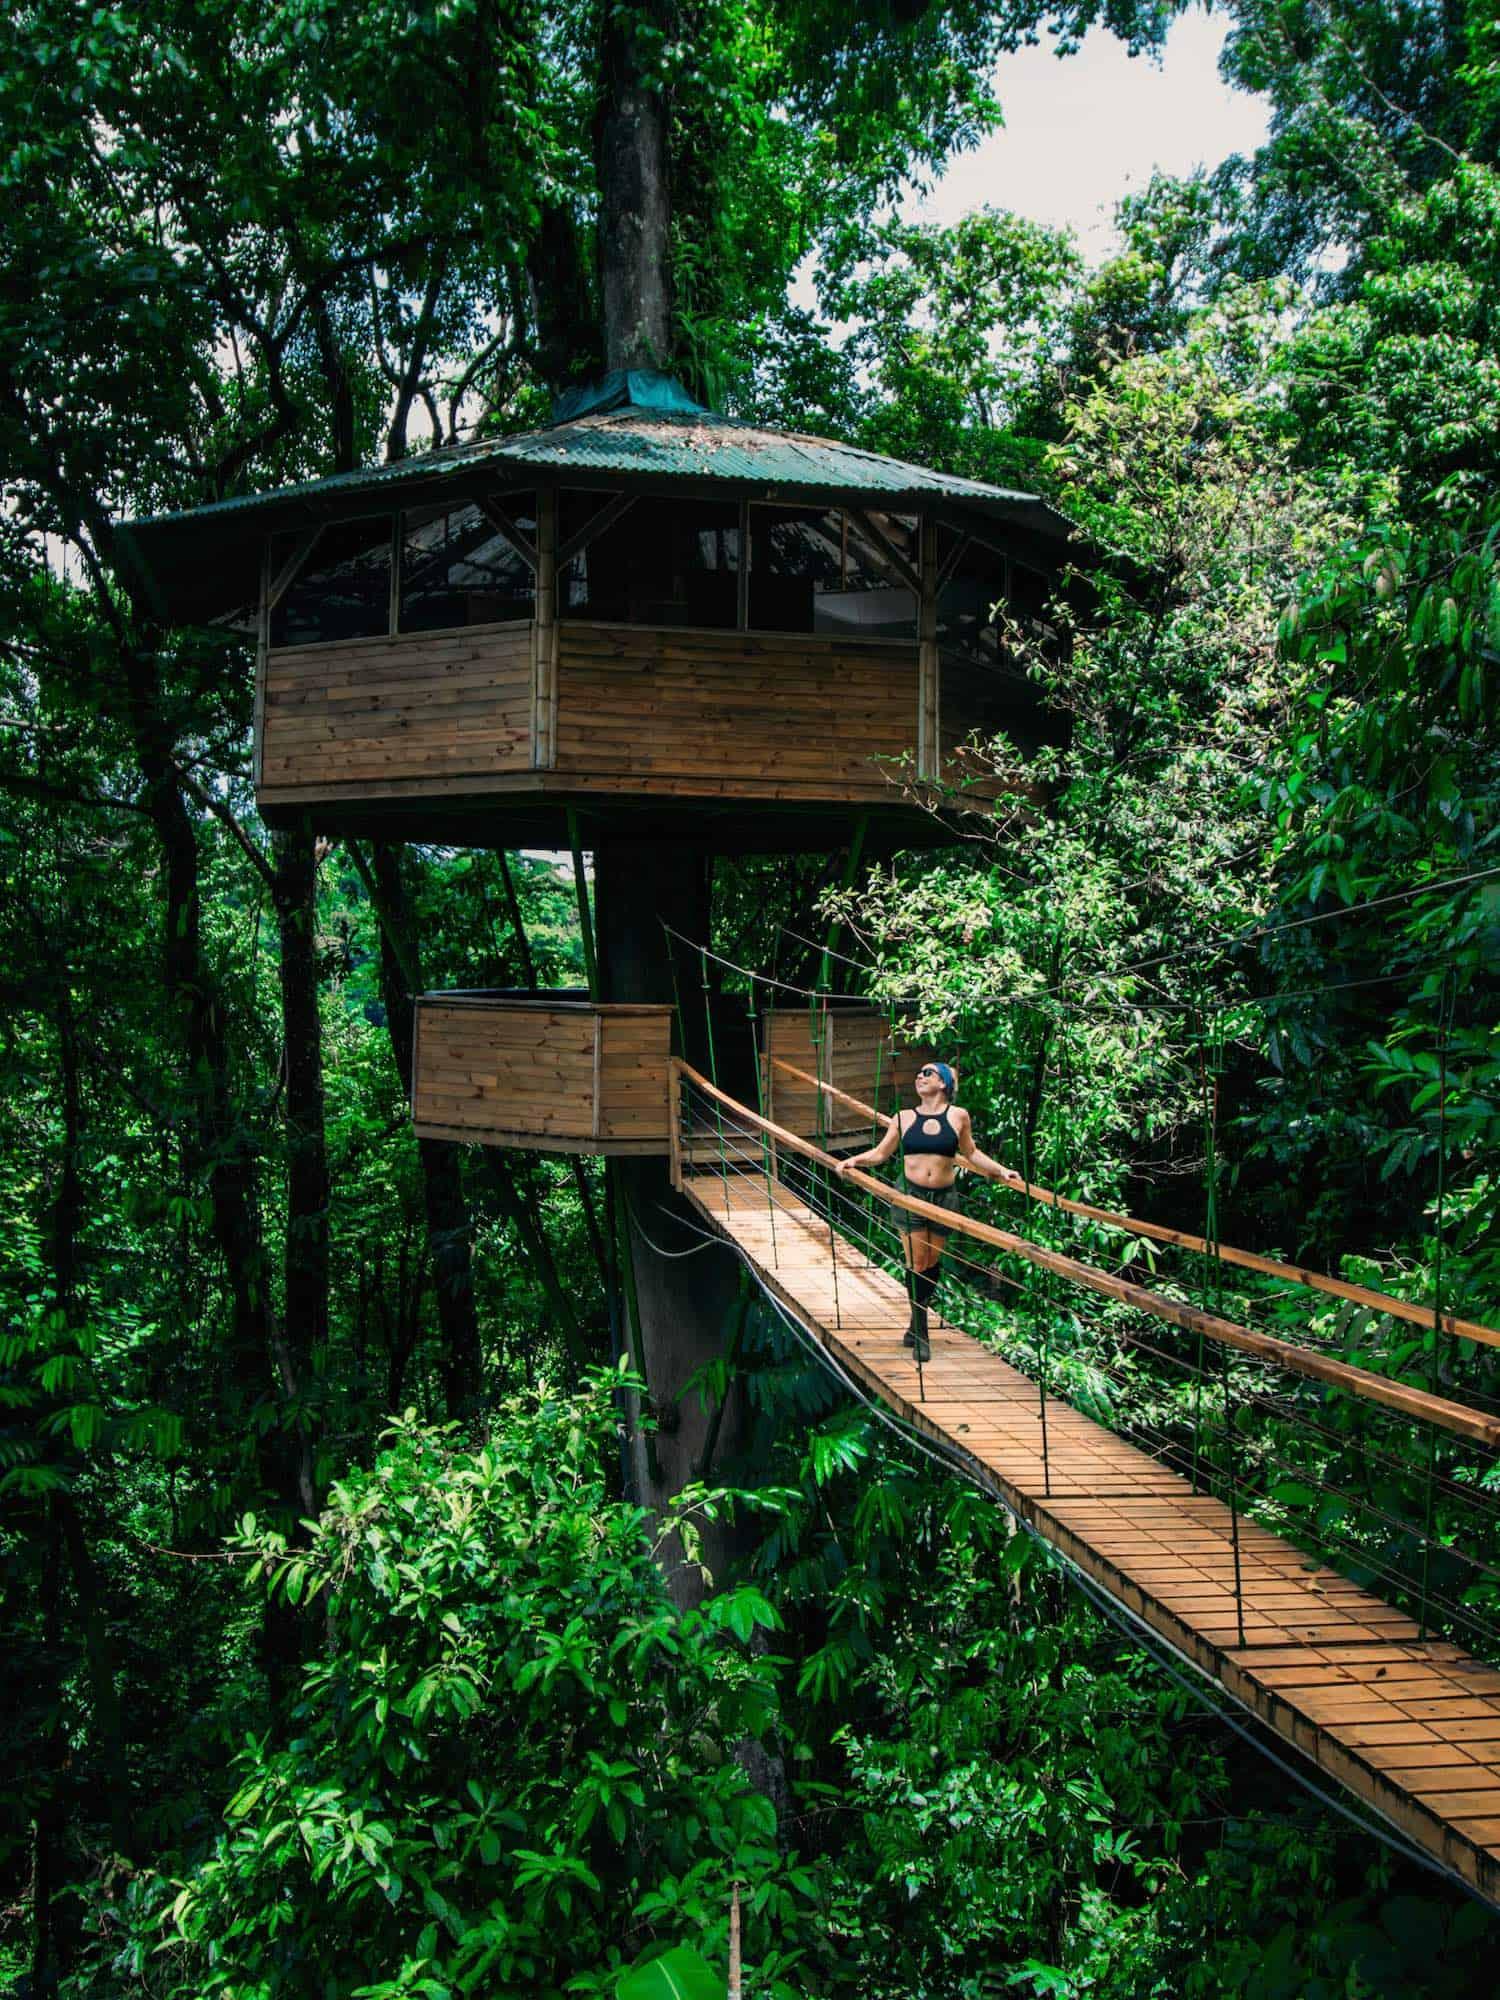 Travel in Costa Rica - Treehouse - Finca Bellavista